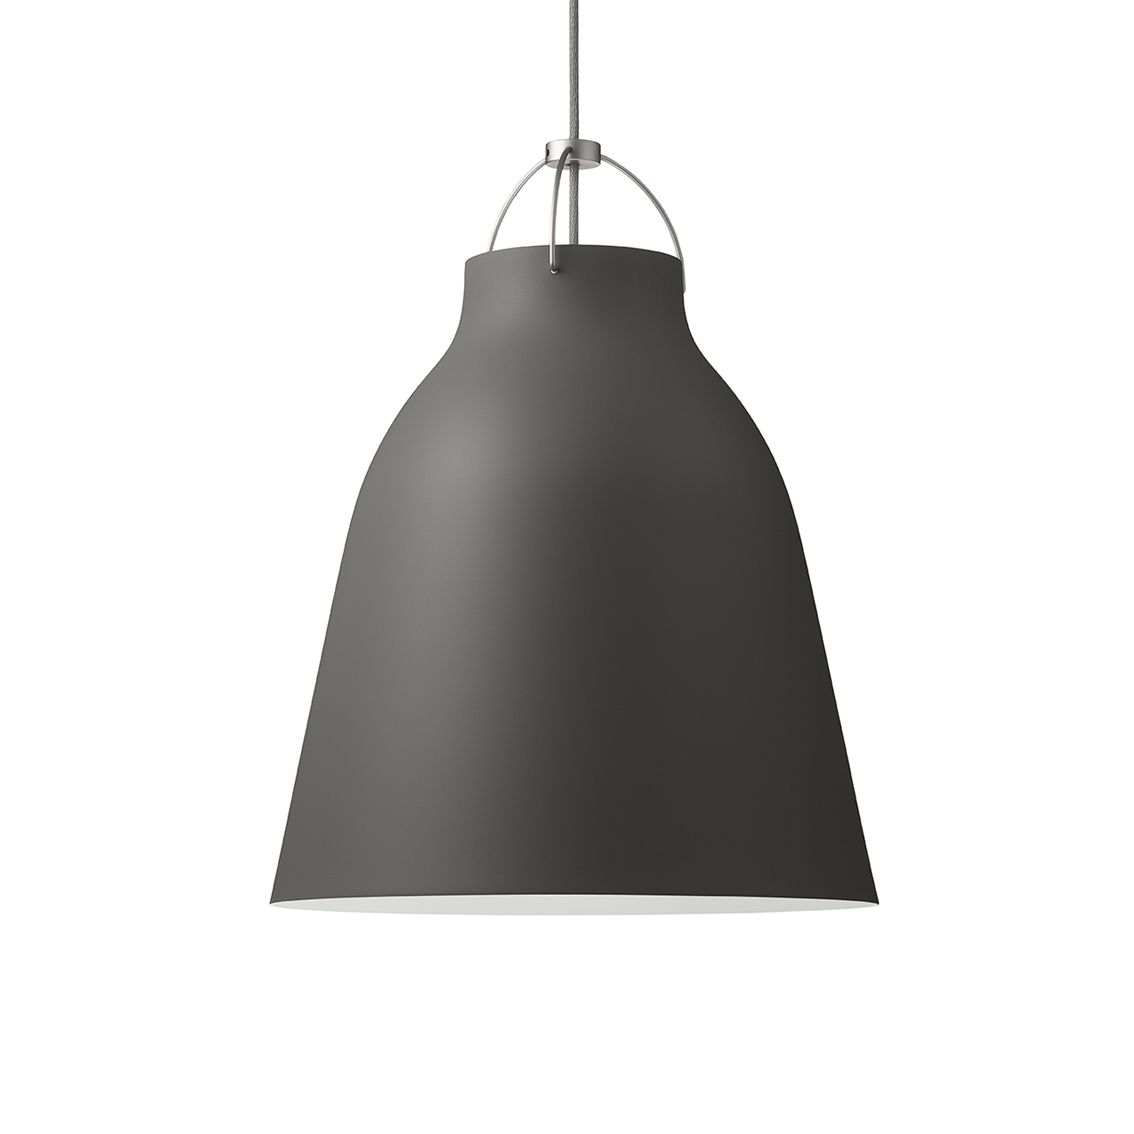 Caravaggio hanglamp Lightyears Ø26 Archipelago Stone